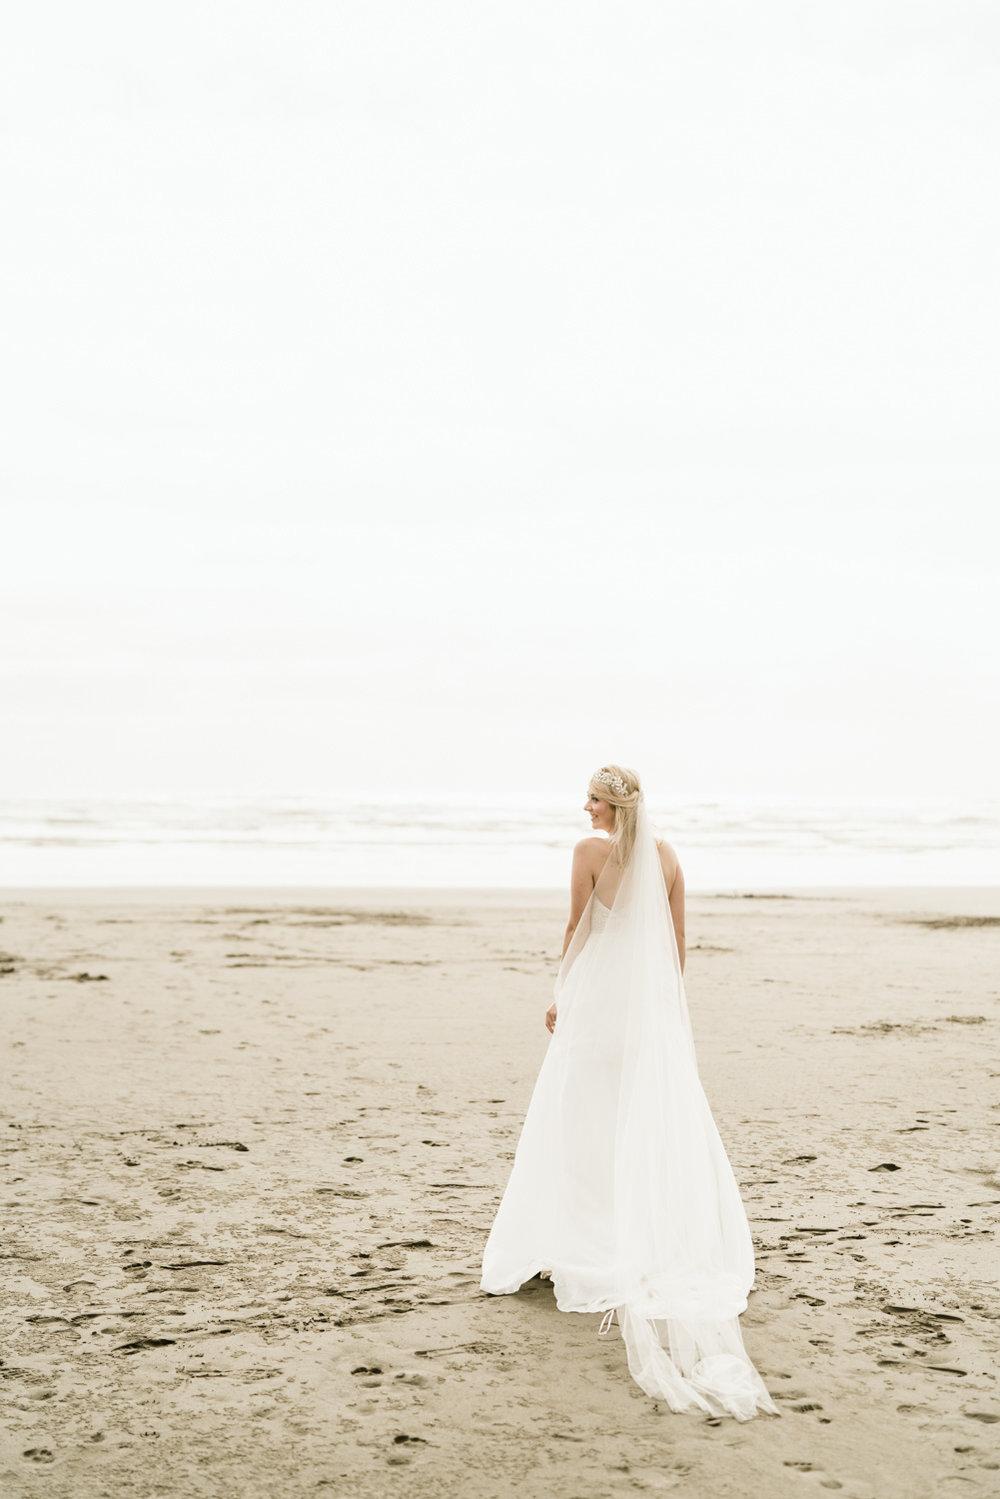 April Yentas Photography - Seabrook Shoot-82.jpg